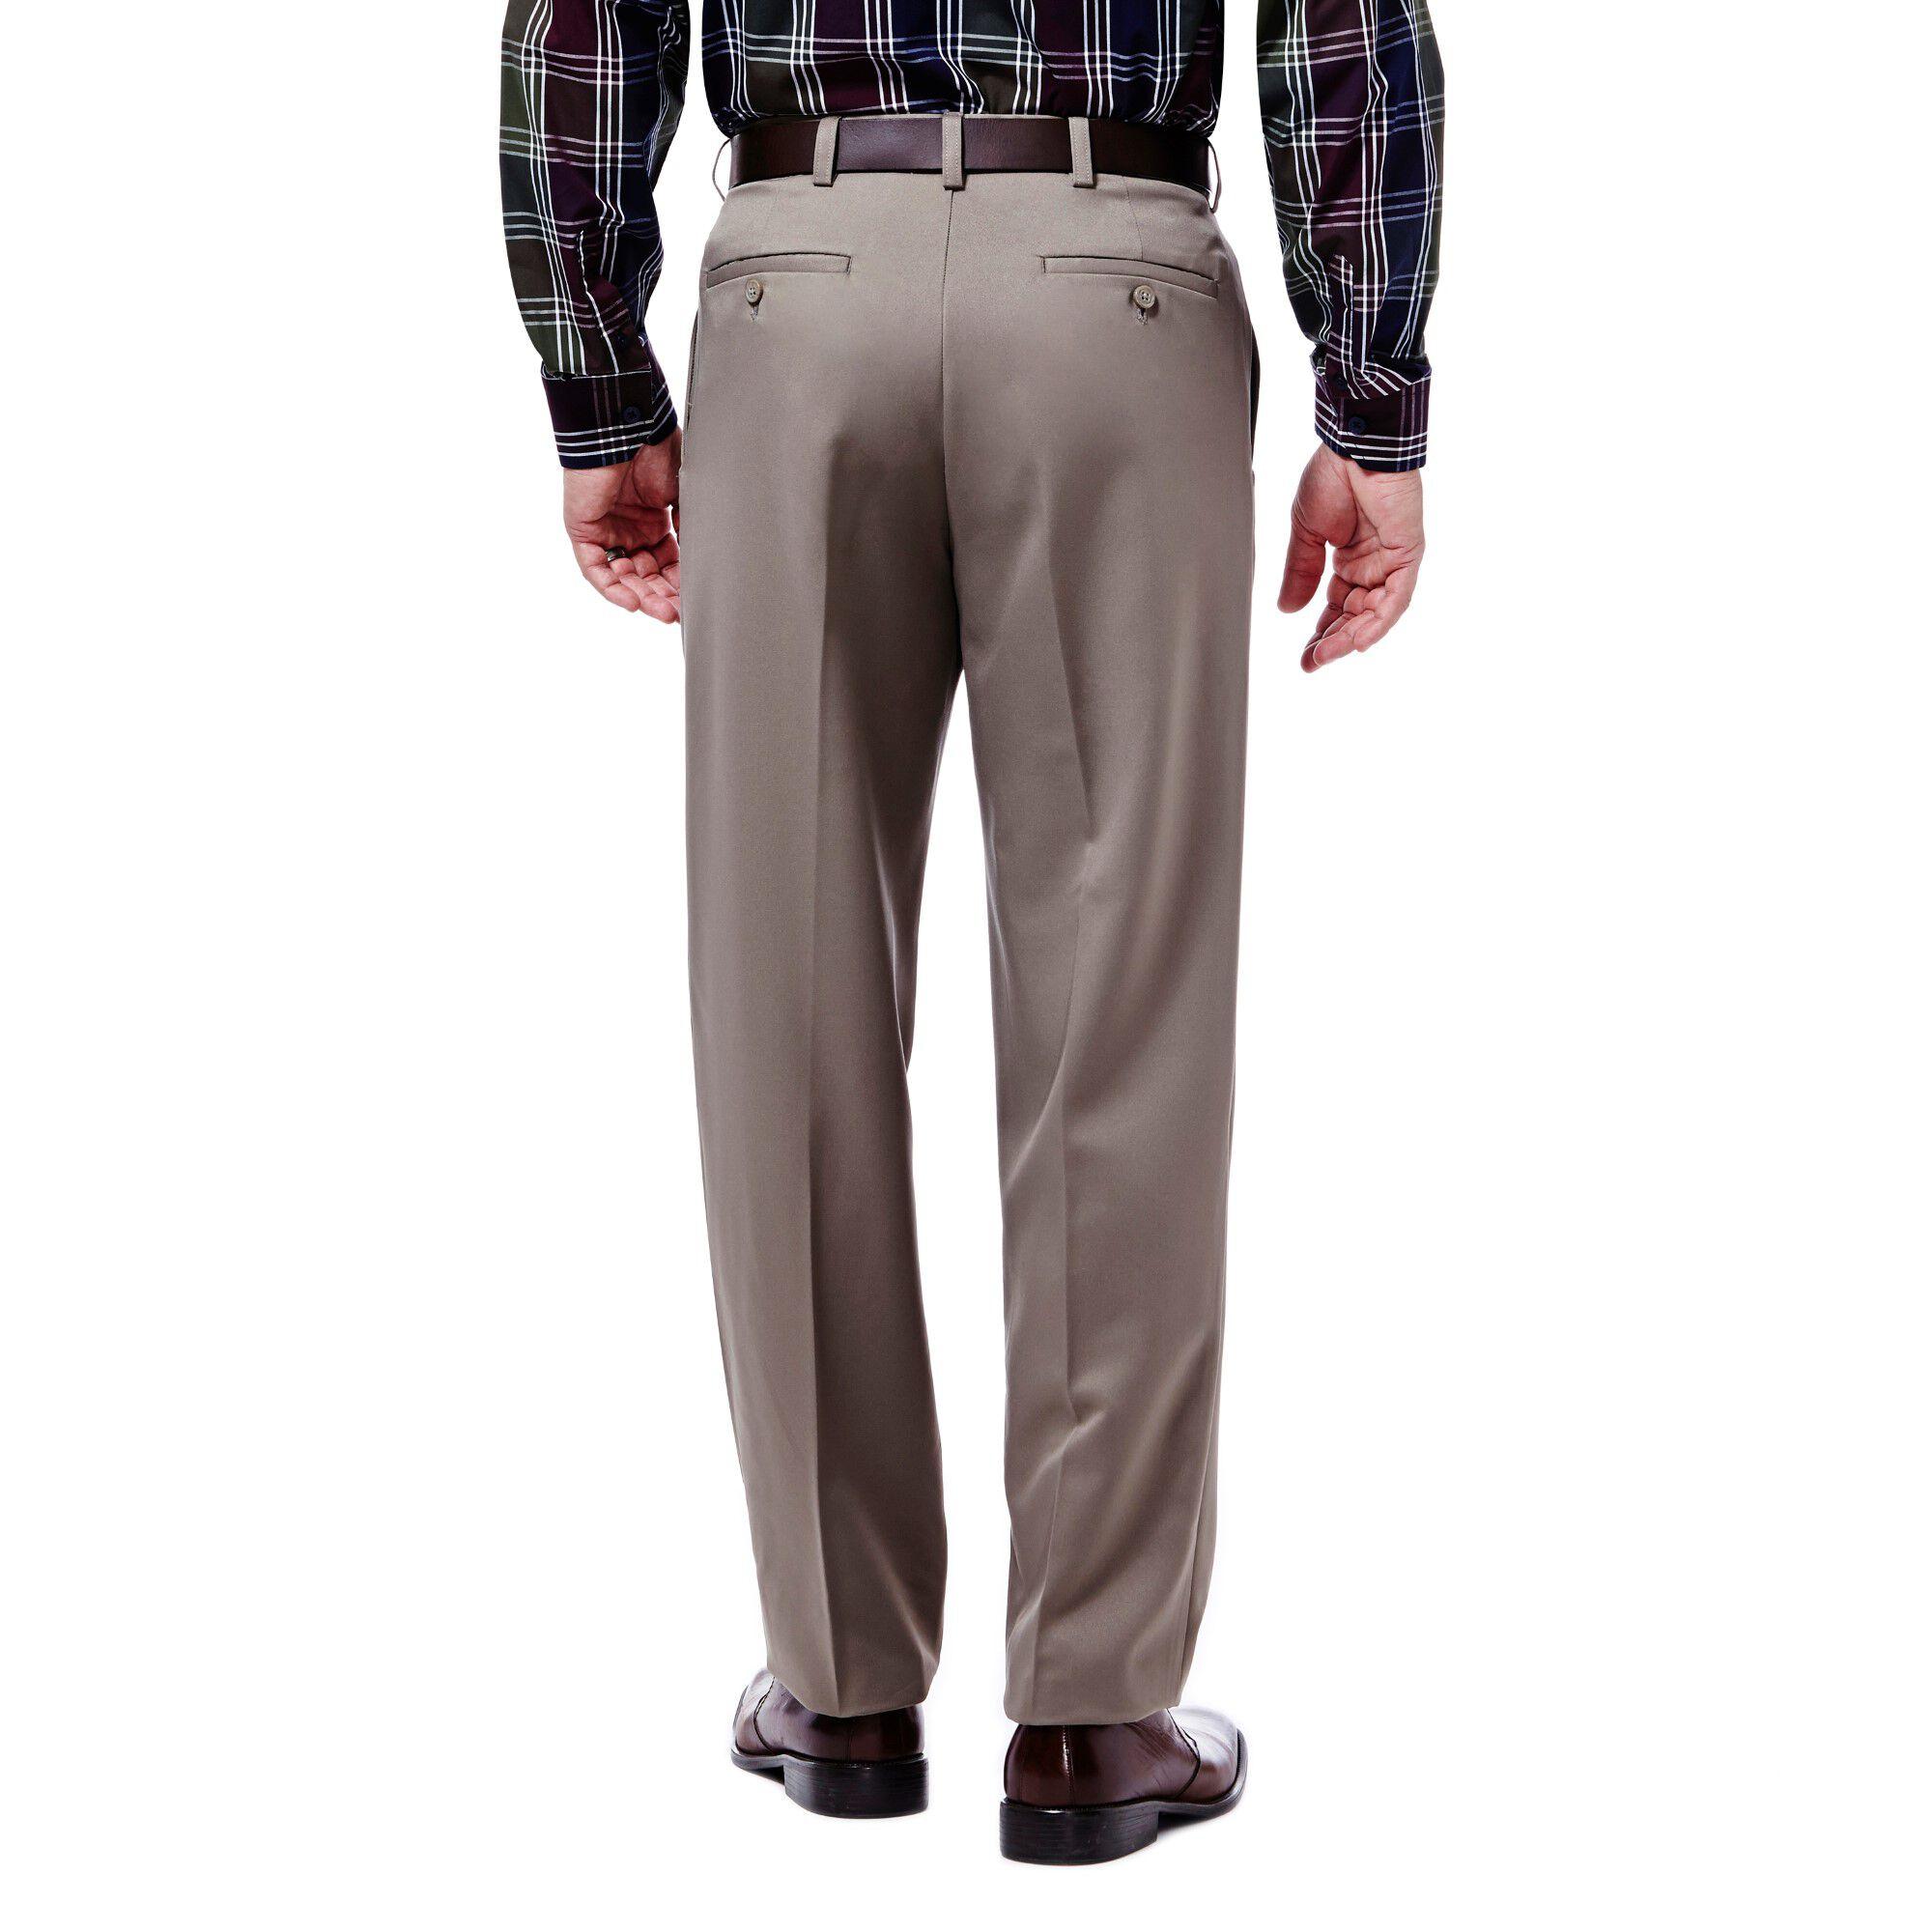 faa3d277ae B&T Cool 18 Pant   Classic Fit, Pleat, No Iron   Haggar.com